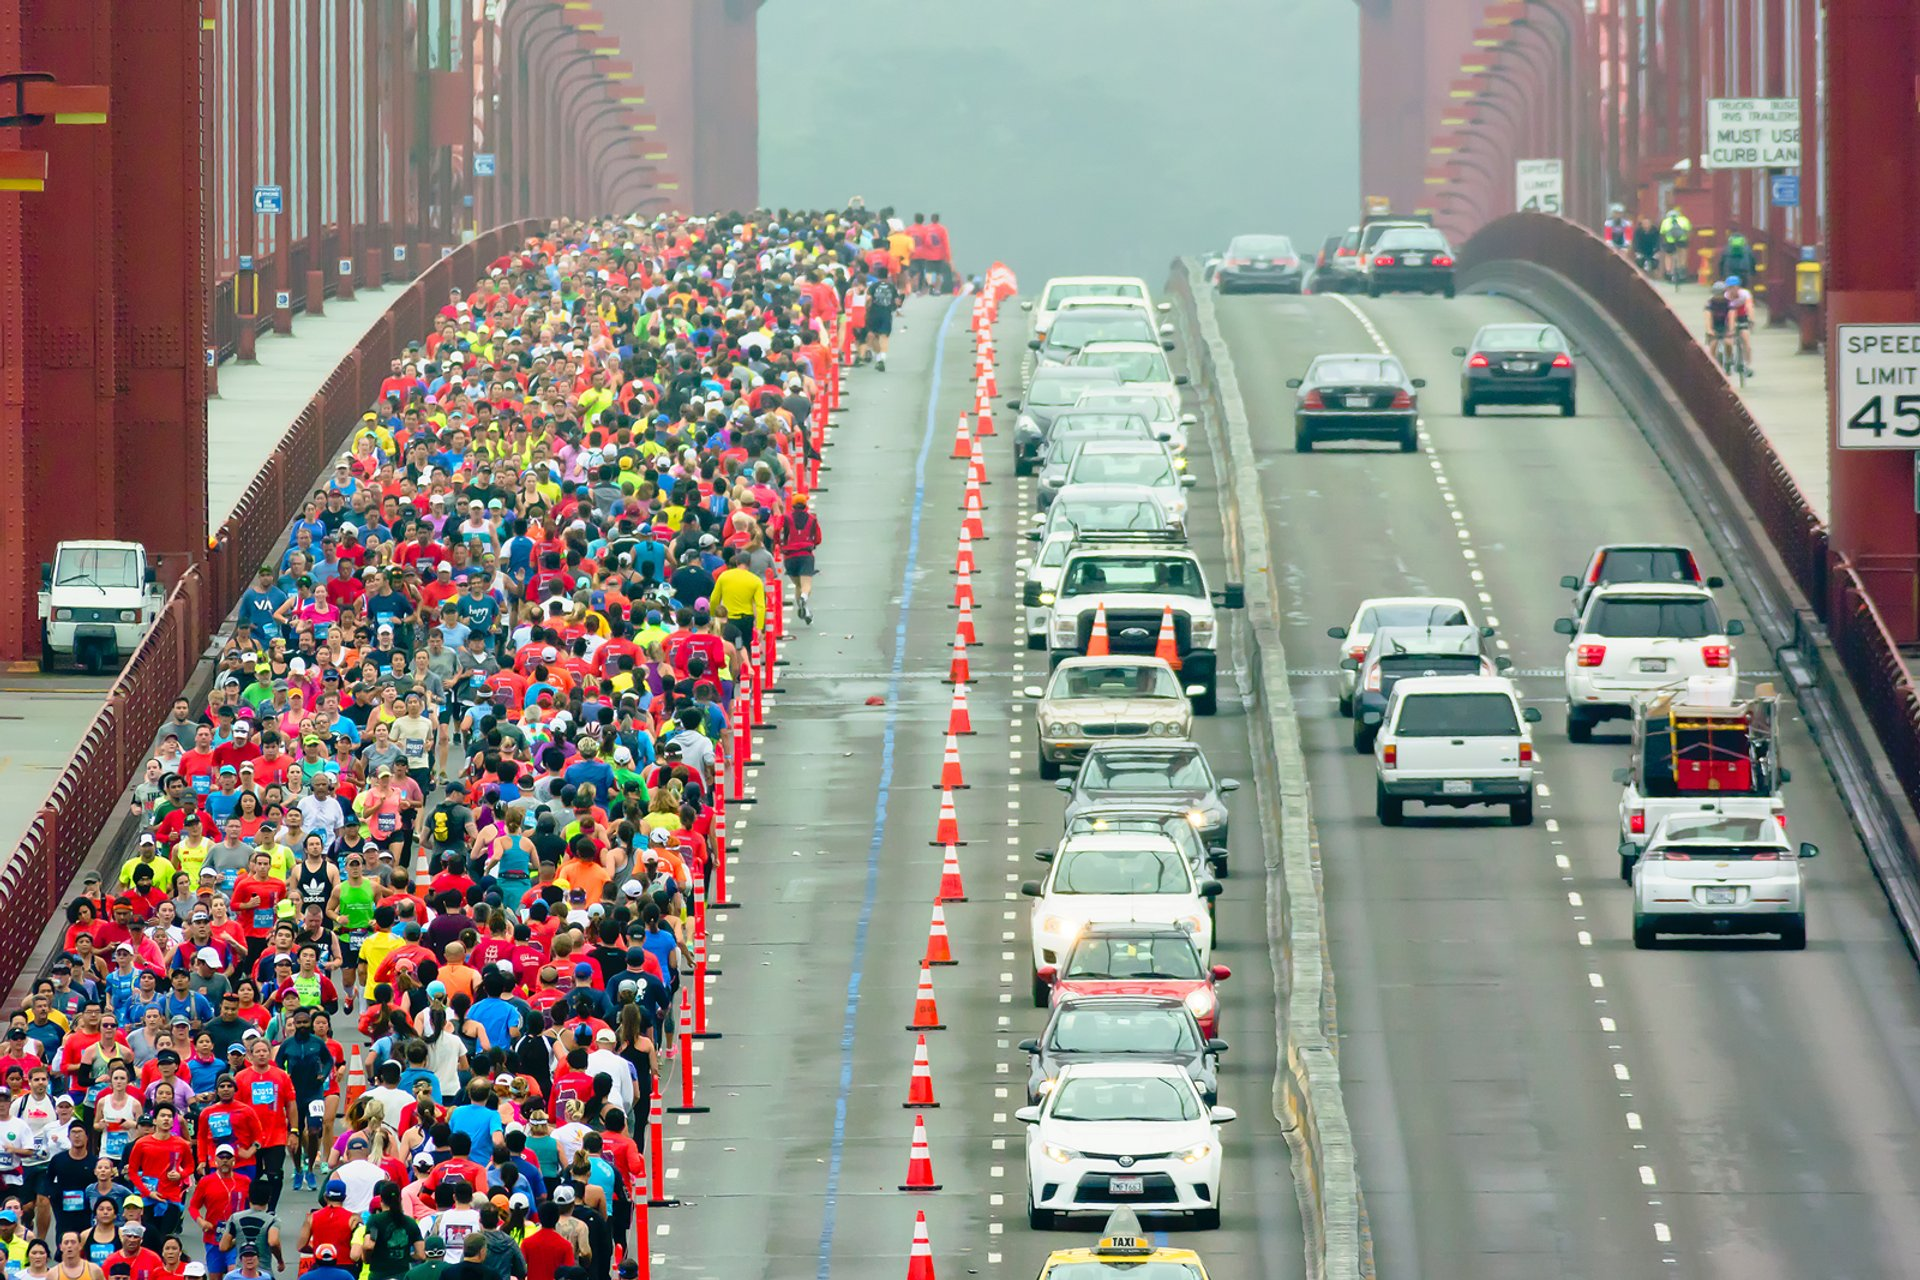 San Francisco Marathon in San Francisco 2019 - Best Time